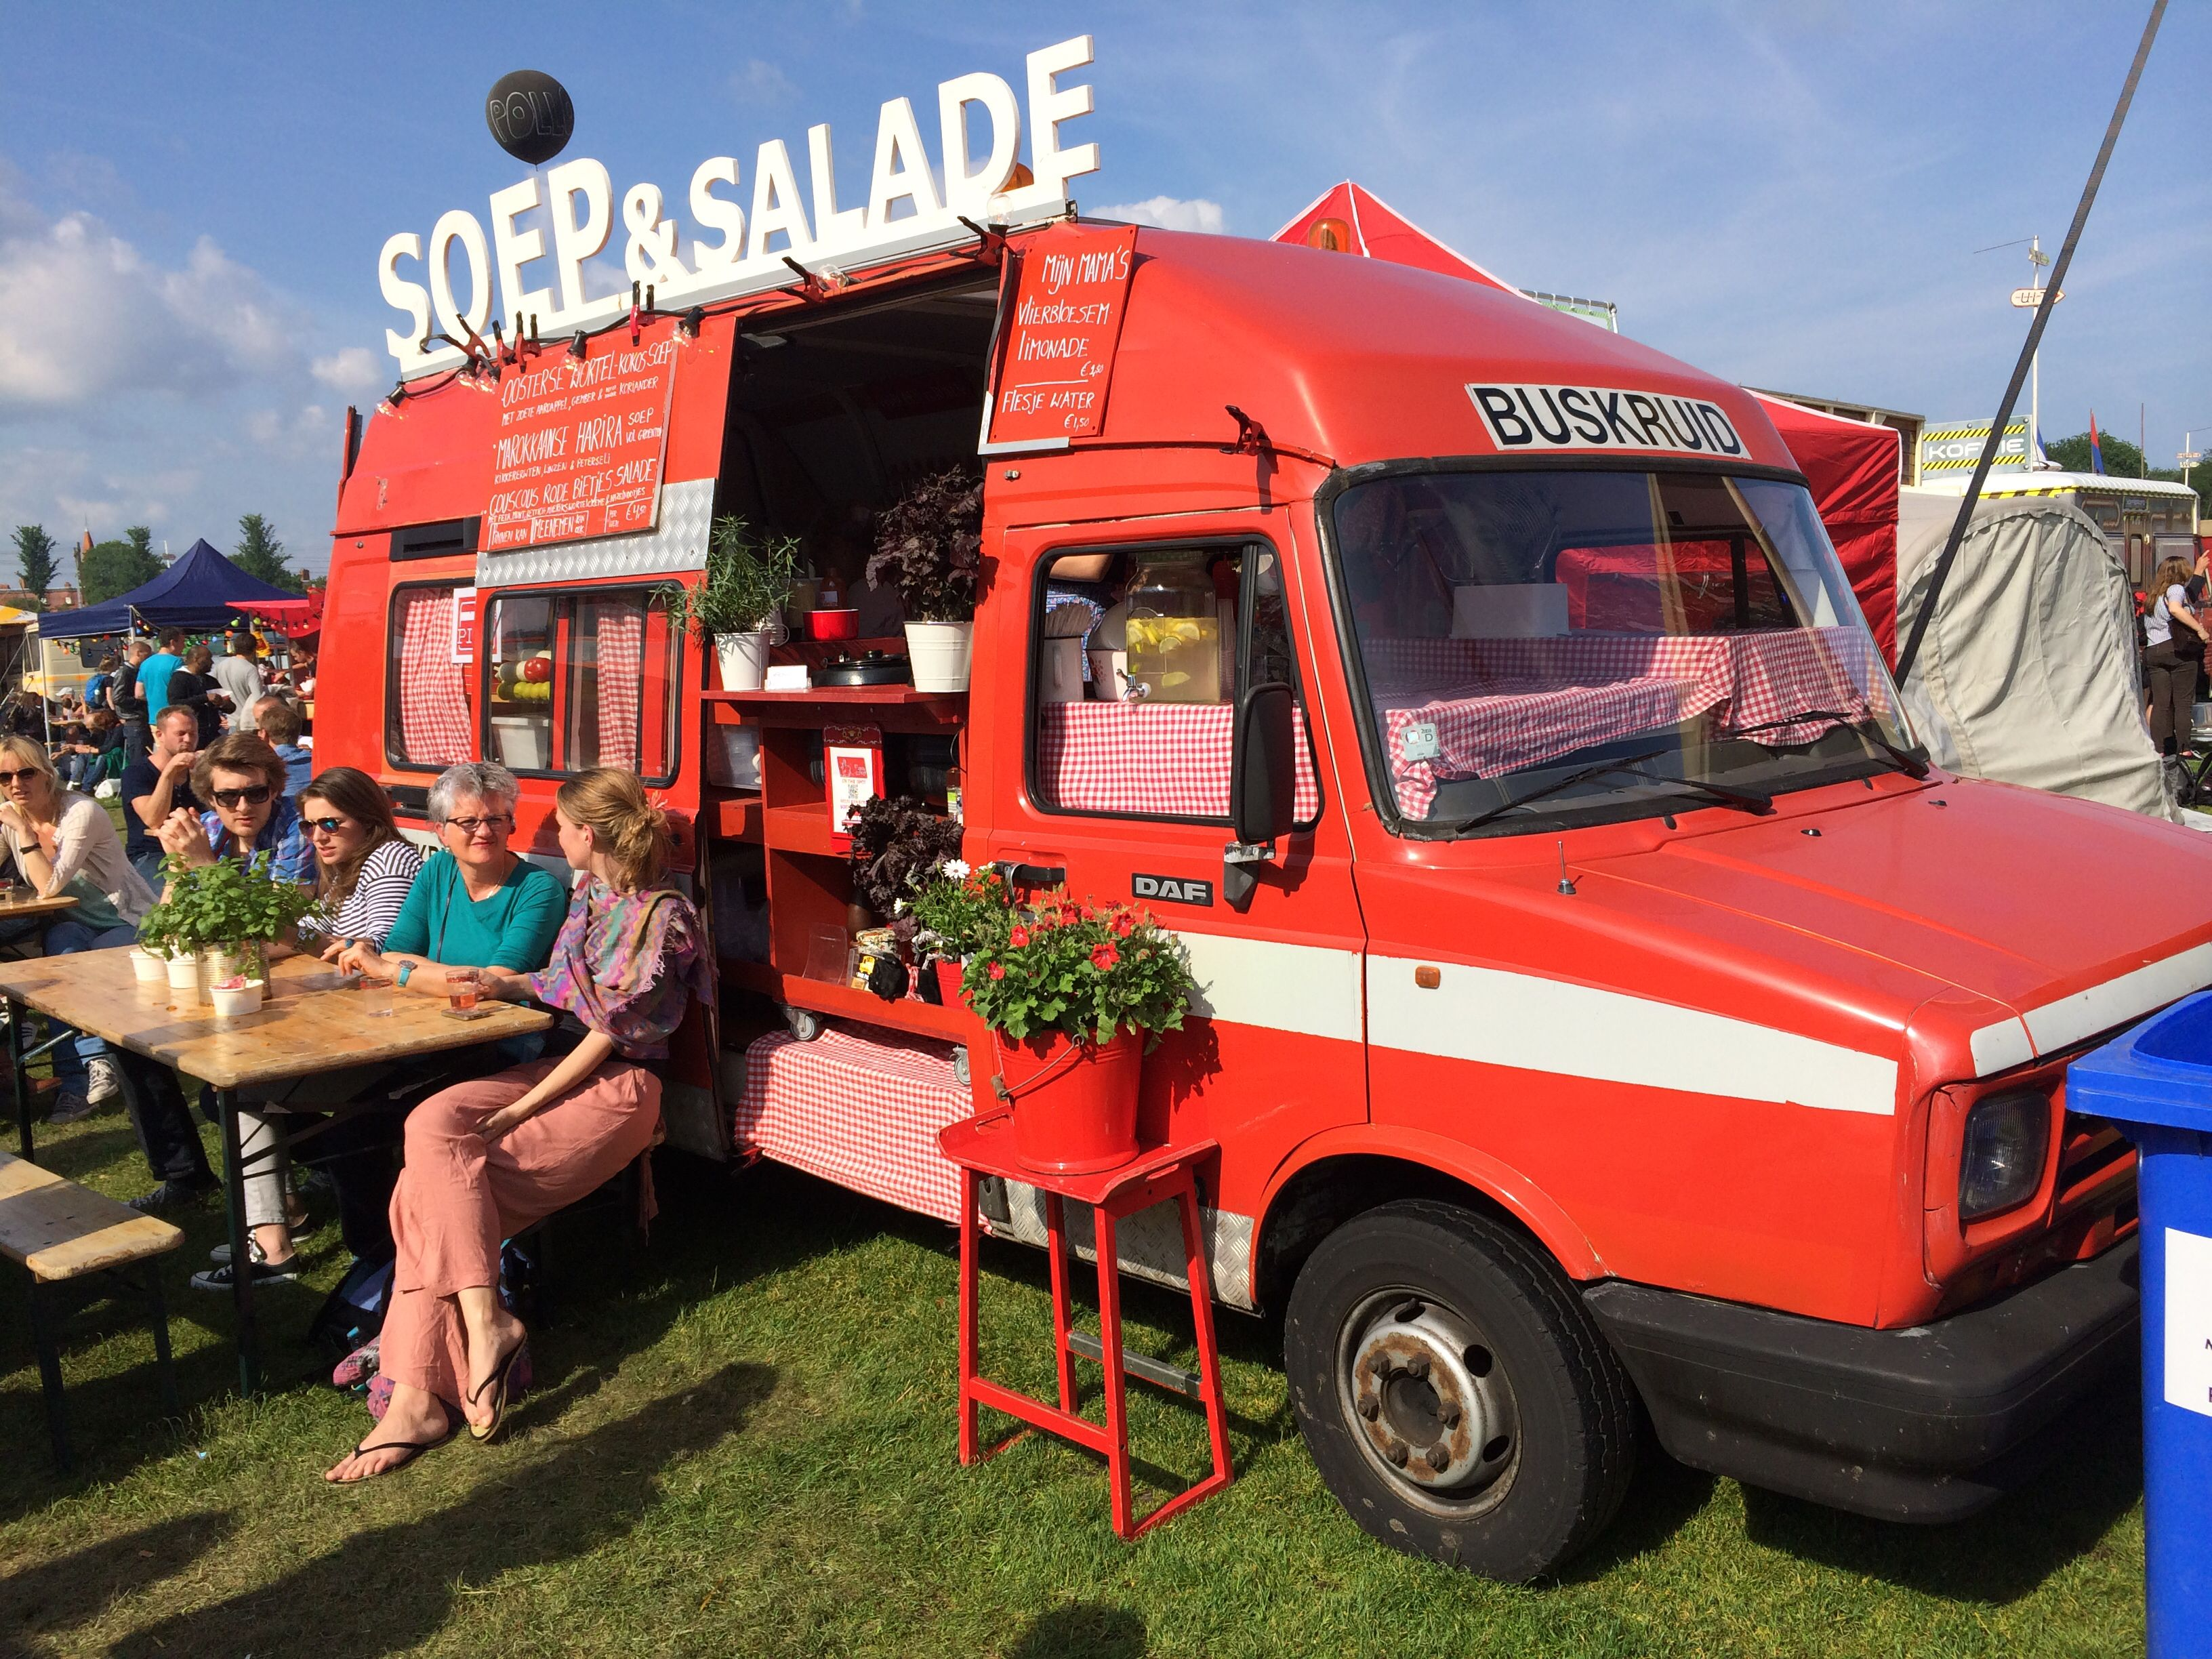 Soep Salade Rollende Keukens Amsterdam